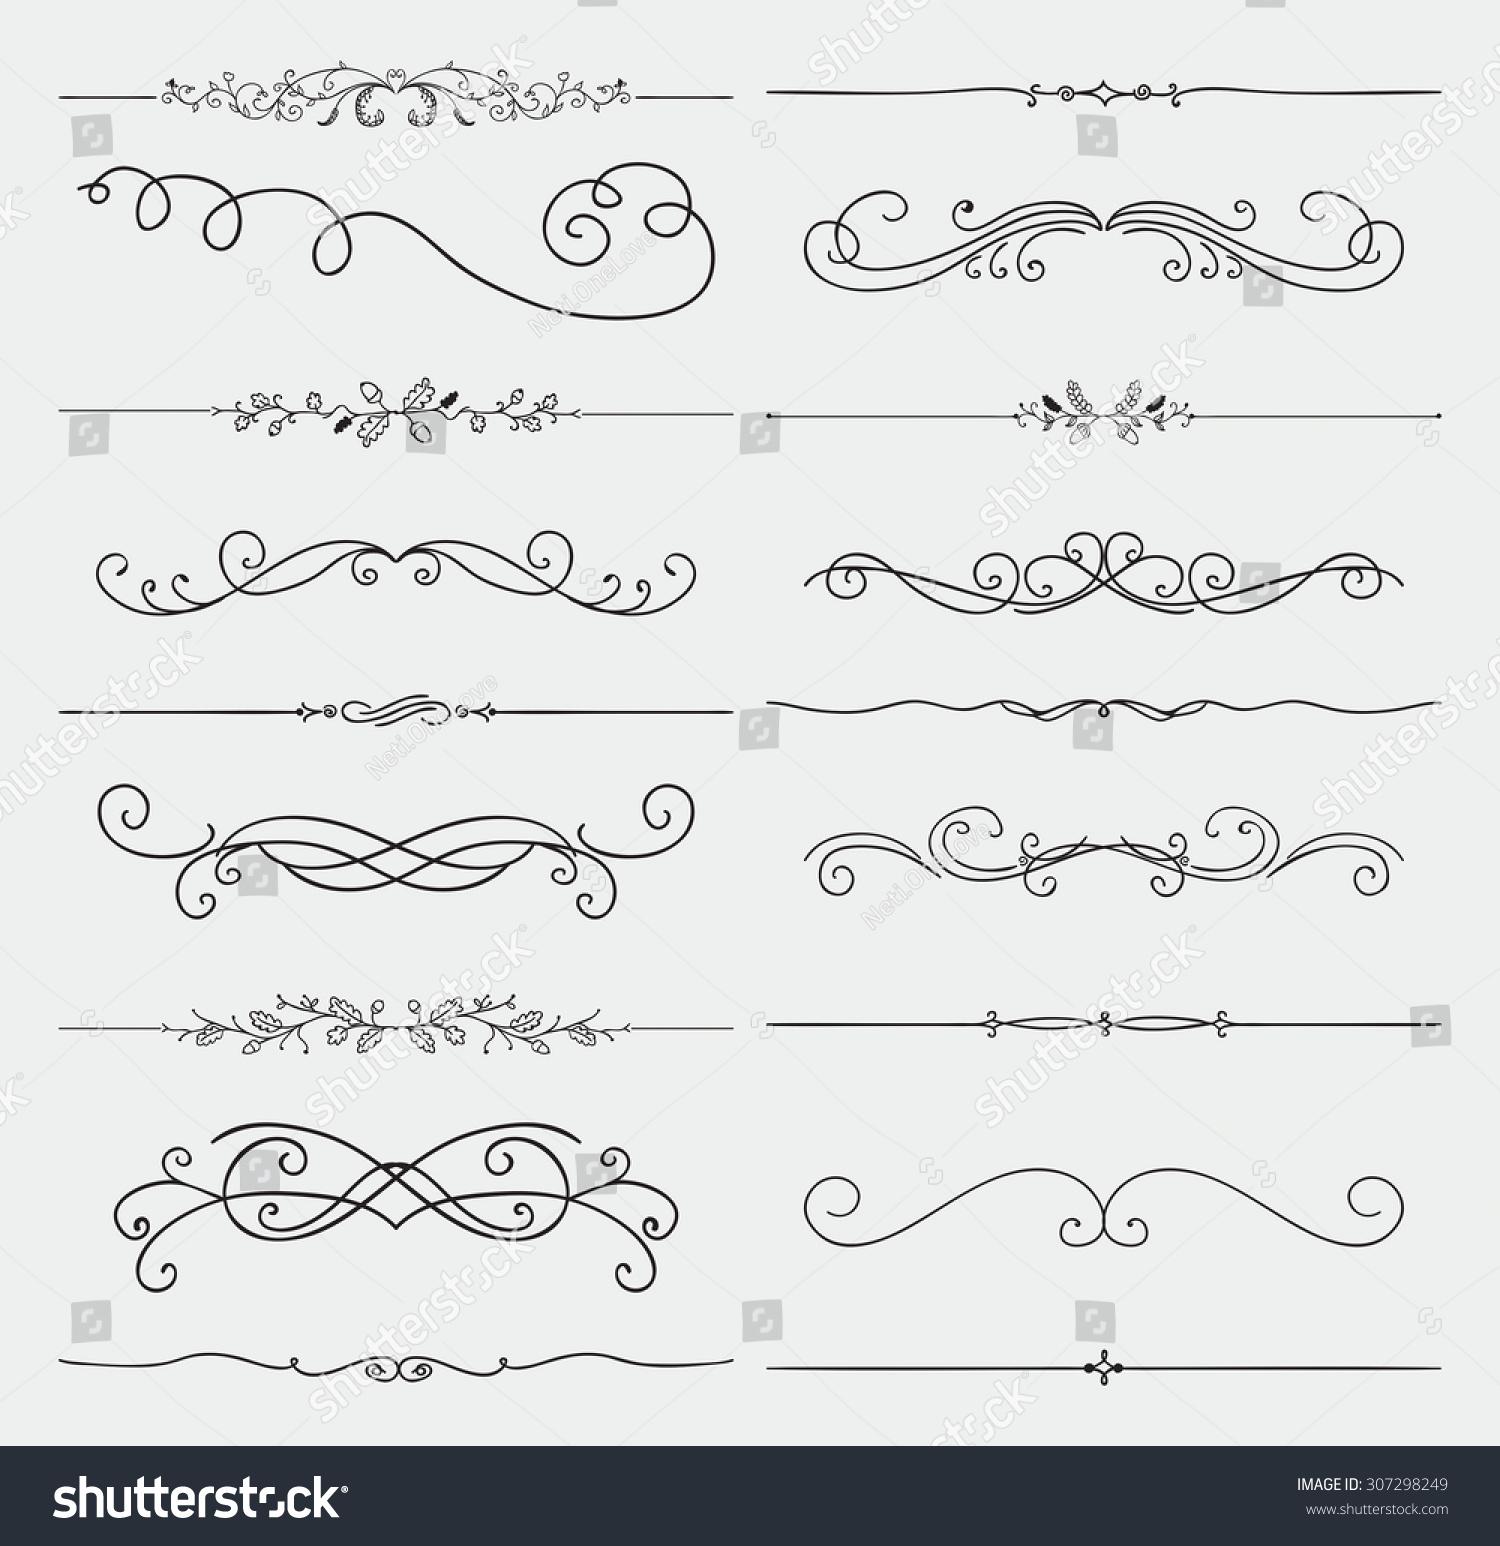 Rustic Scroll Design: Set Of Black Hand Drawn Rustic Doodle Design Elements